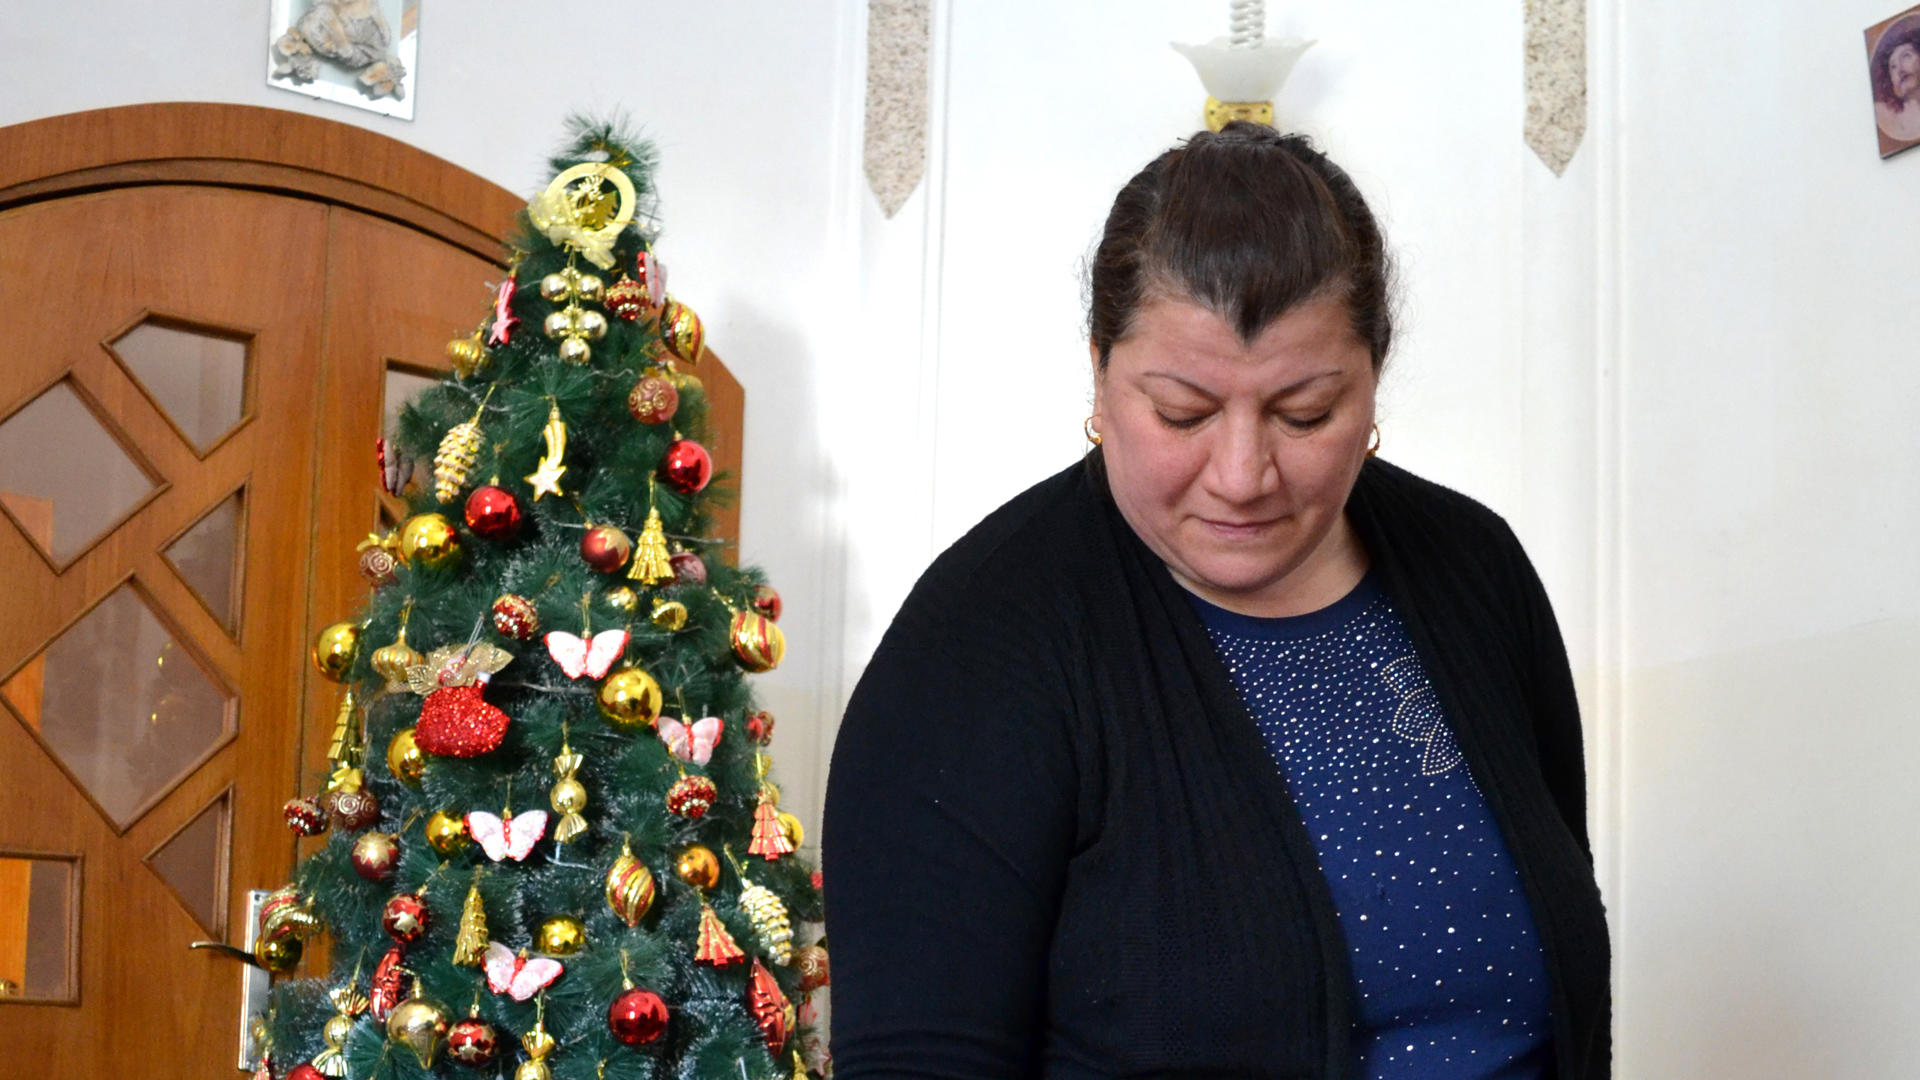 Linda Abid Younis with her Christmas tree